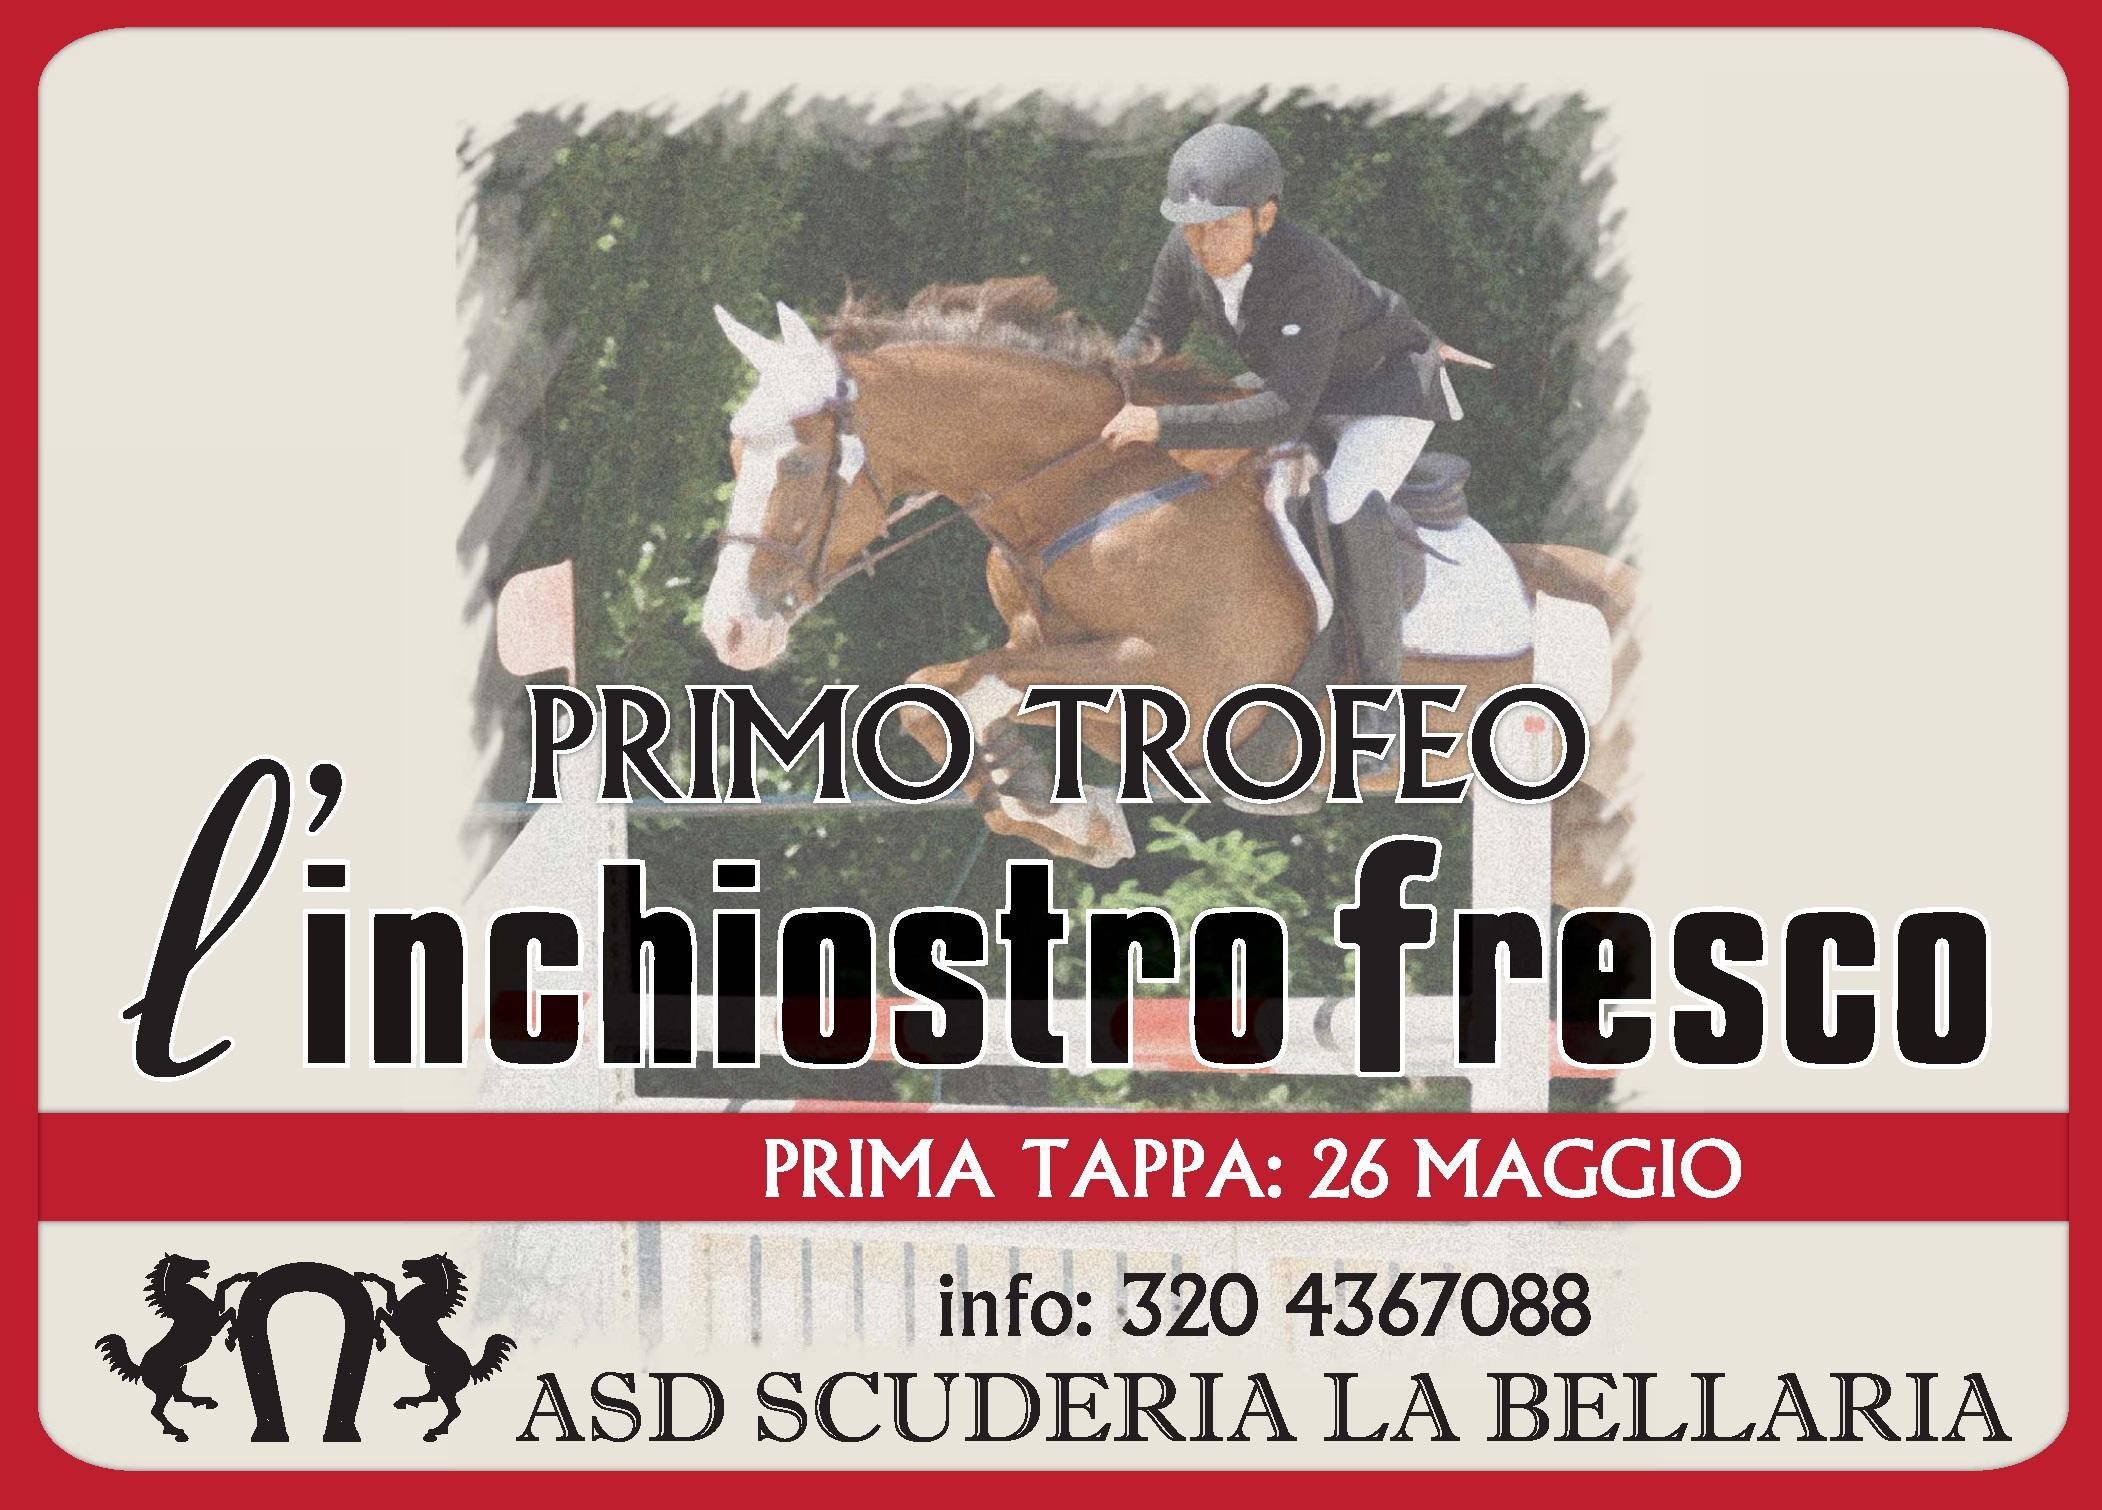 ASD Scuderia La Bellaria (Novi Ligure, AL) I_trofeo_IF